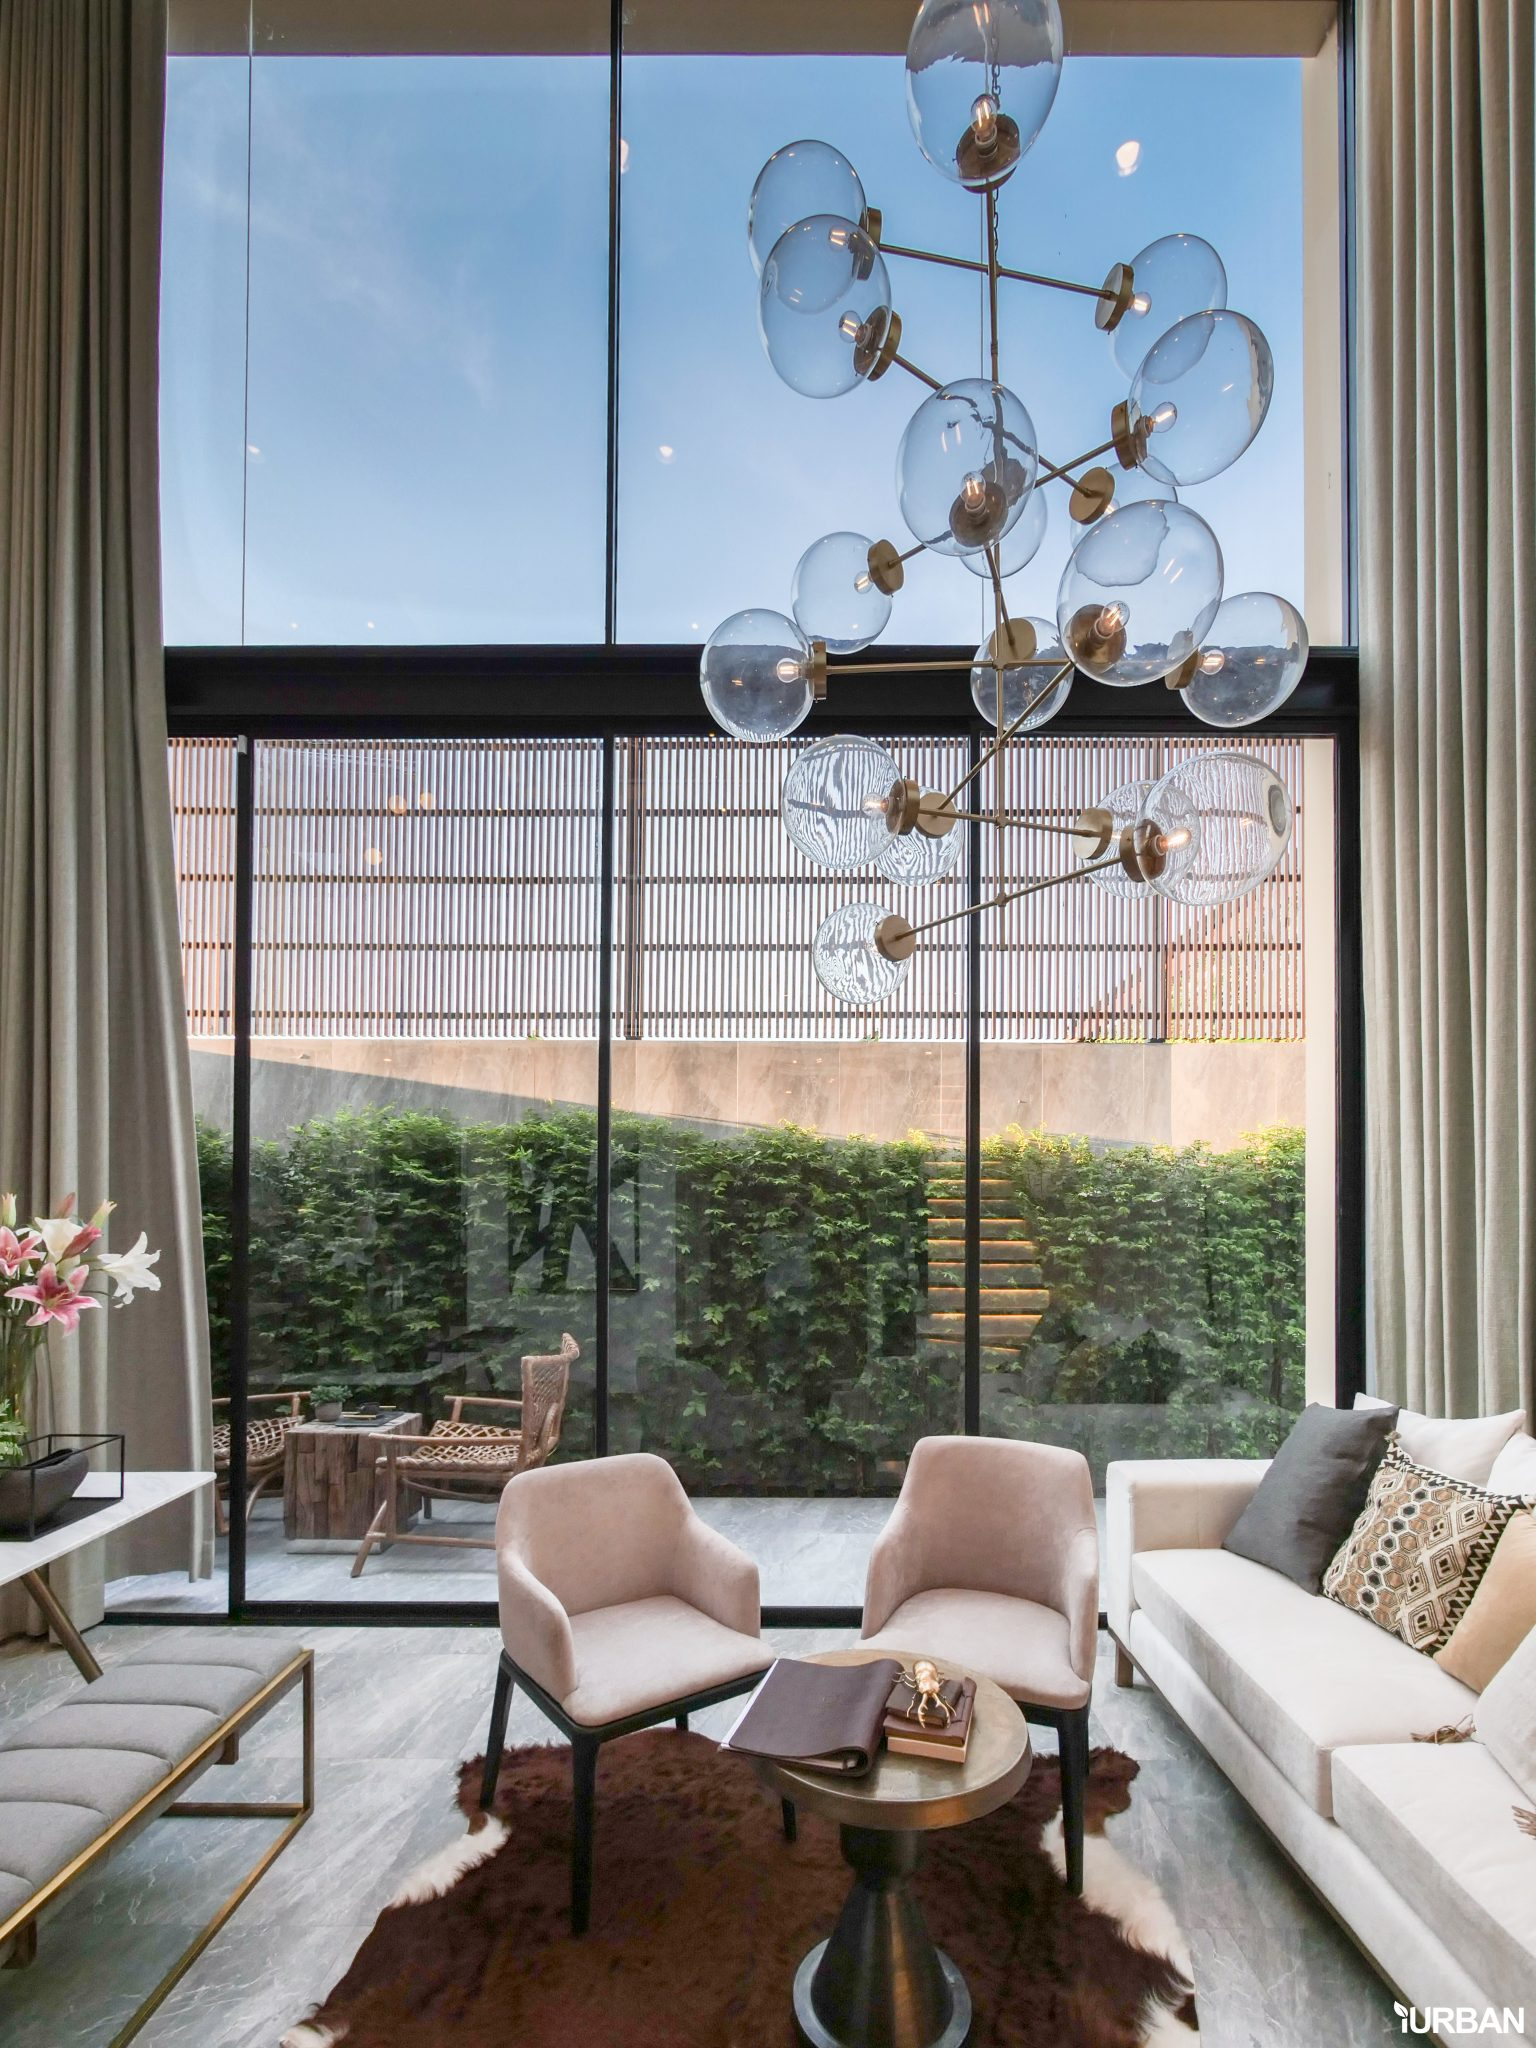 AIRES RAMA9 รีวิว Luxury Townhome 3.5 ชั้น + Rooftop ออกแบบสวย ย่านพระราม9 (ใกล้ รพ.สมิติเวช) 23 - AIRES